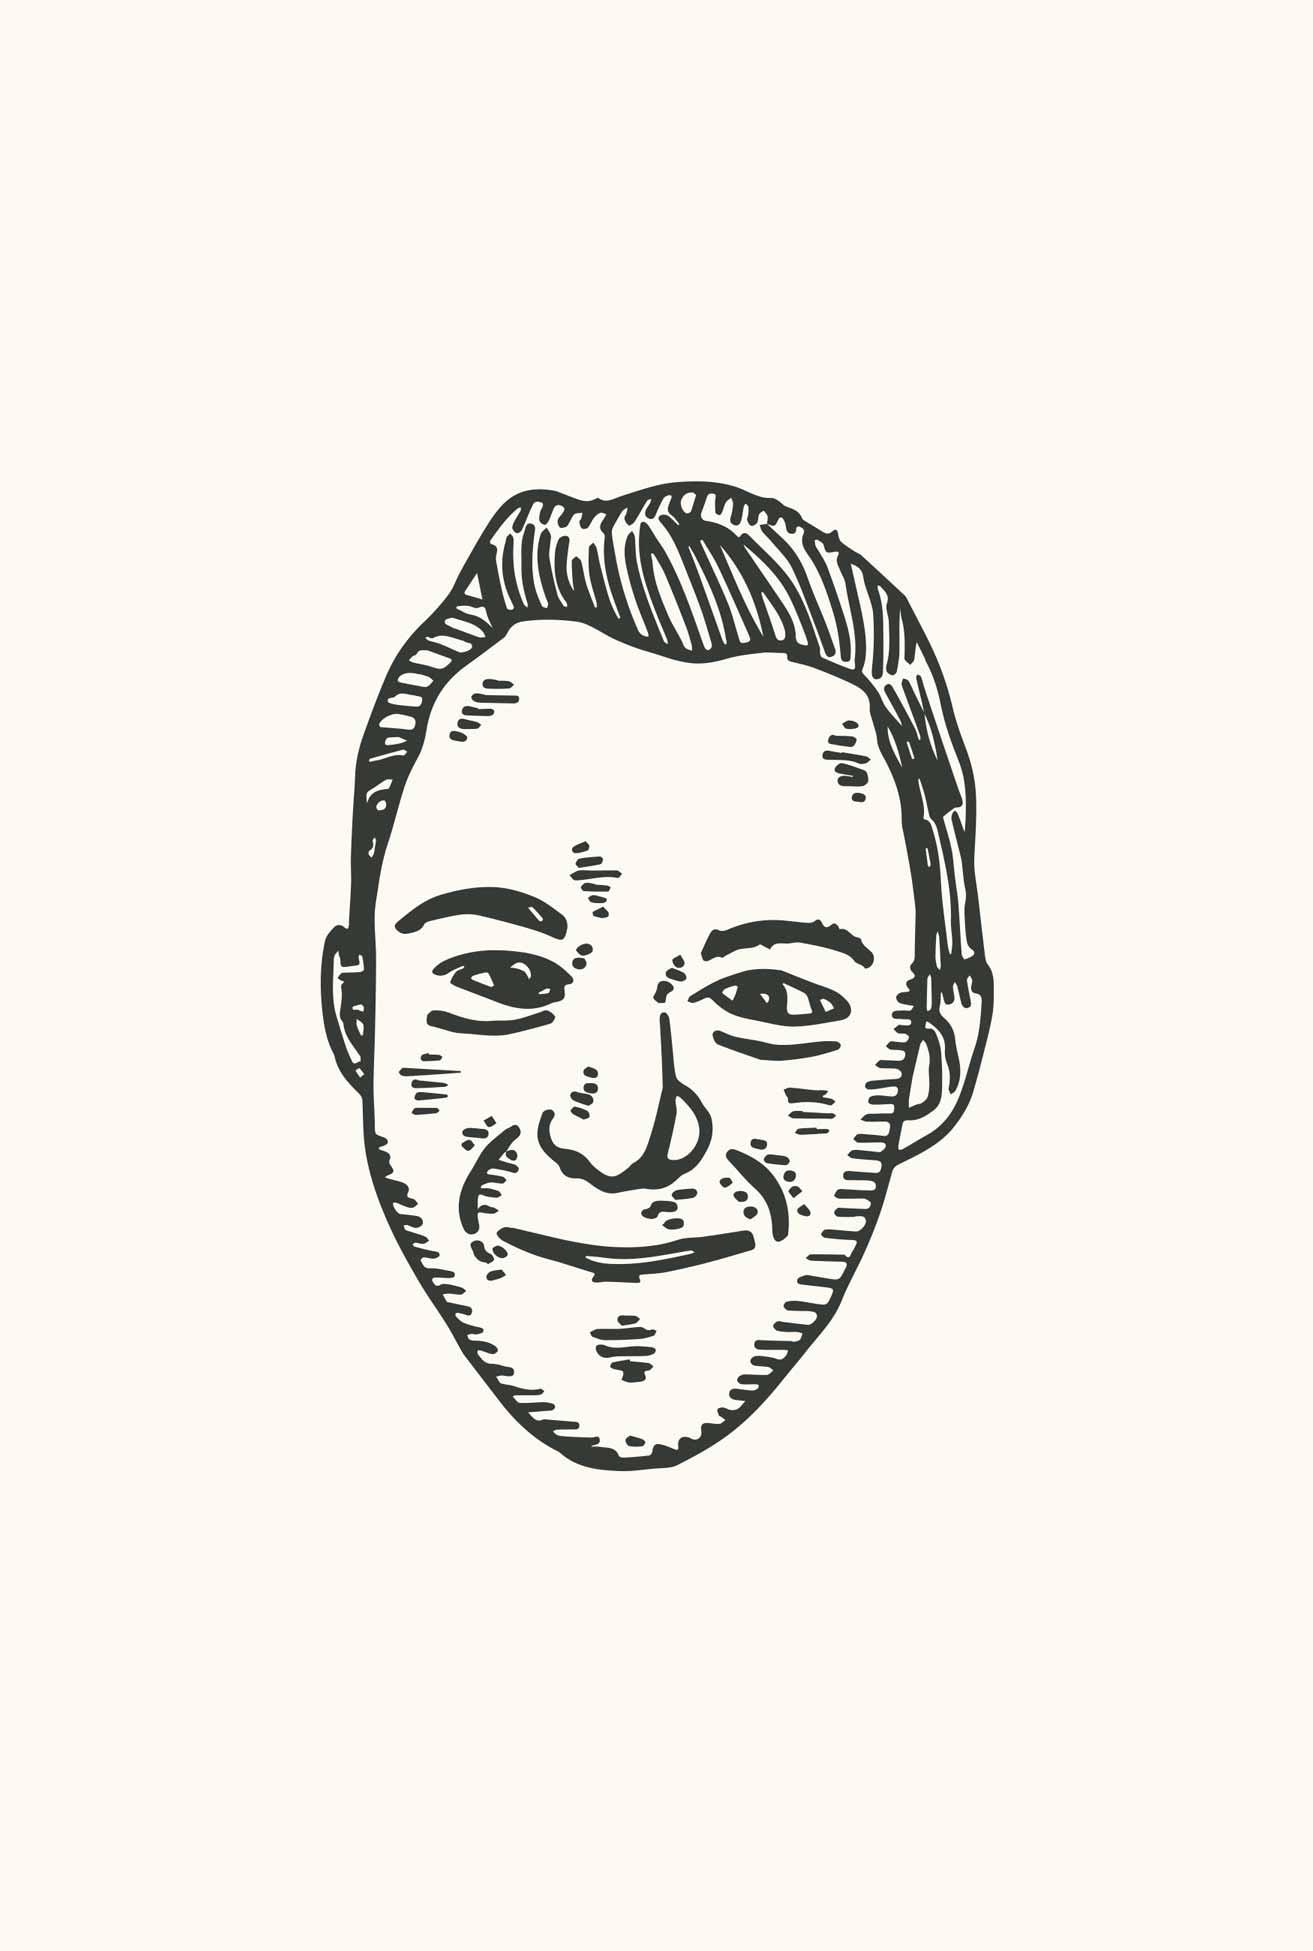 weldonjack-vert_jack-illustration.jpg